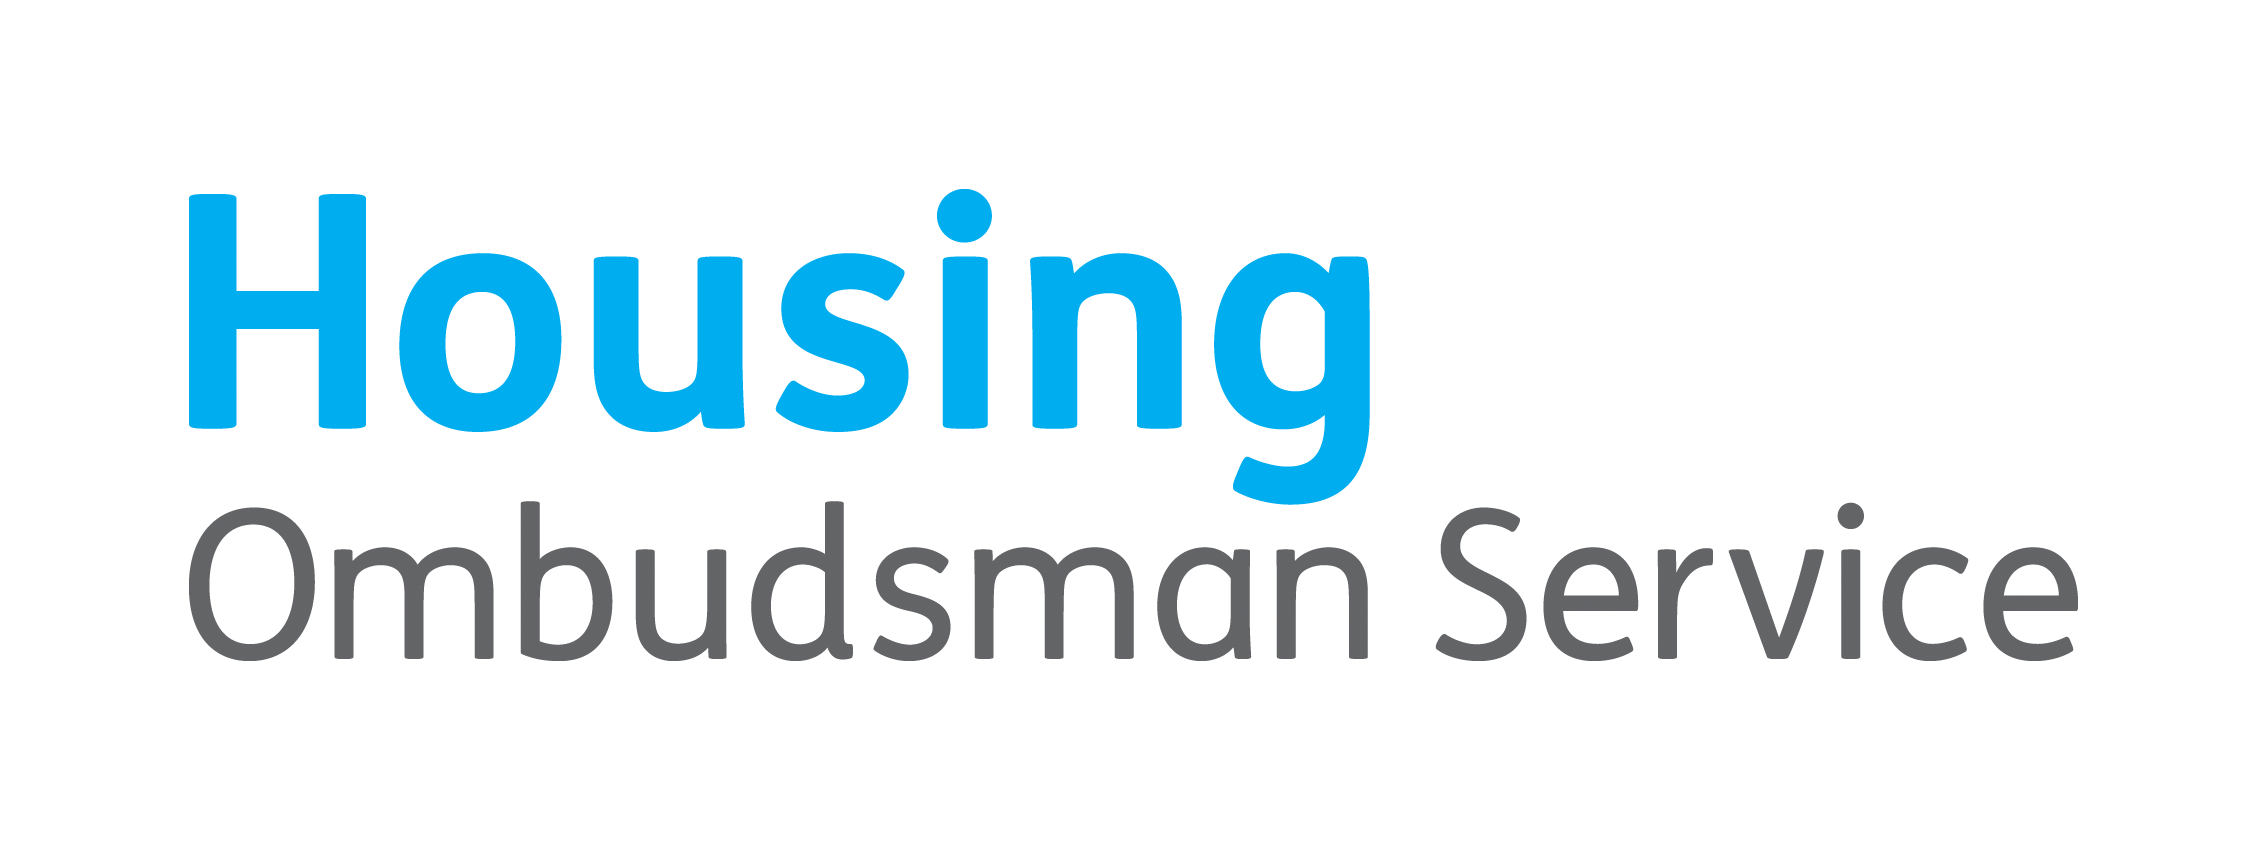 Housing Ombudsman